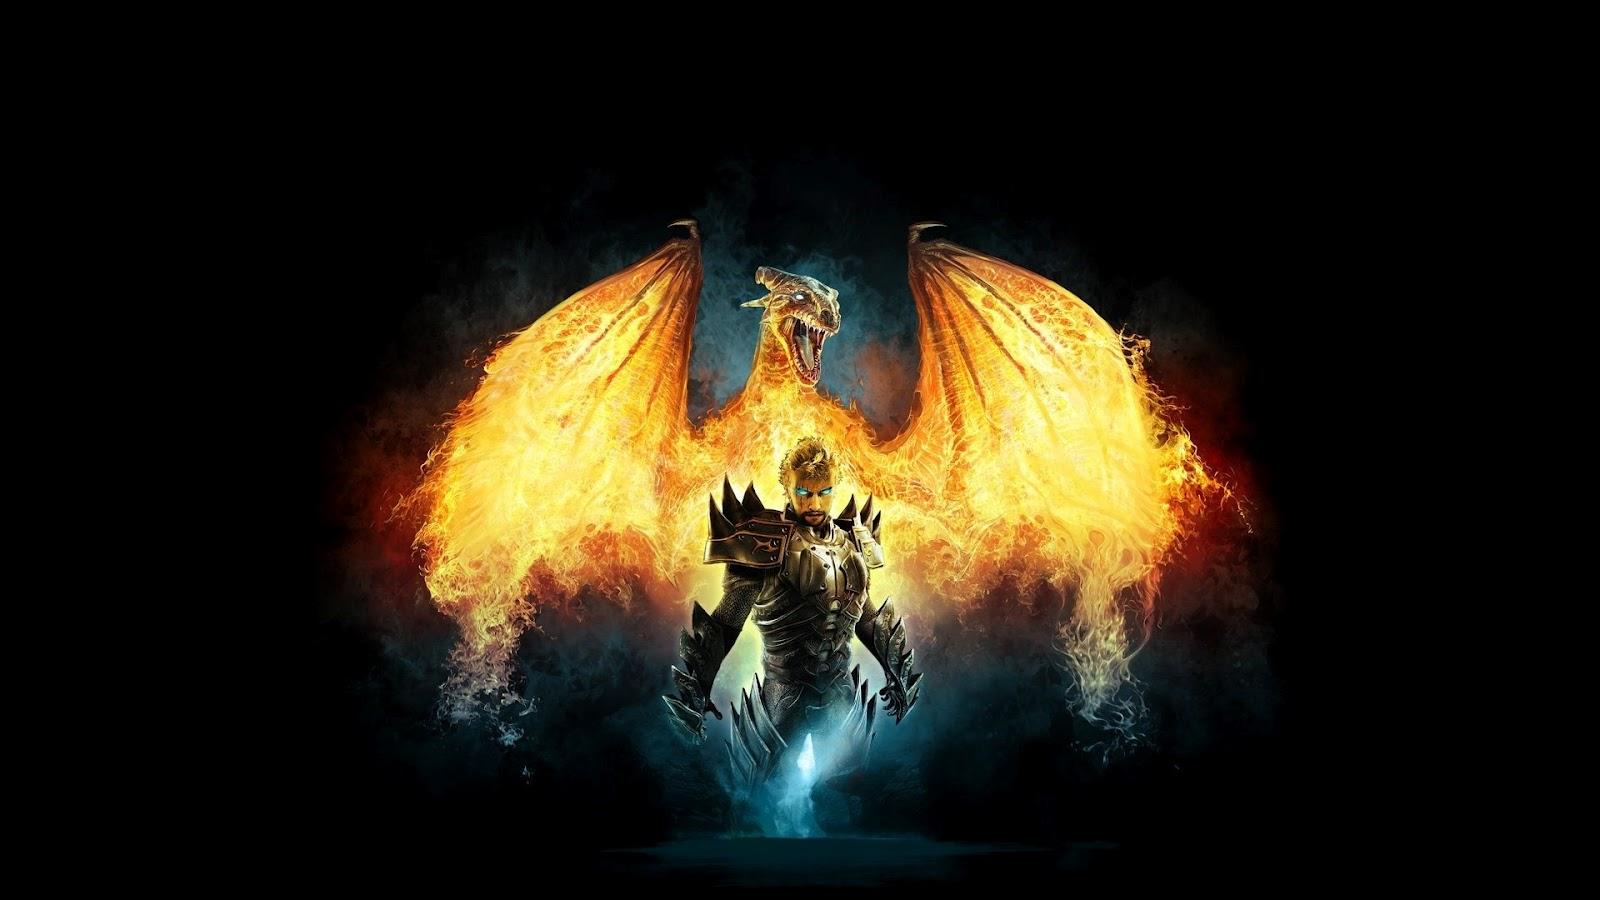 Dragon on Fire Full HD Desktop Wallpapers 1080p 1600x900